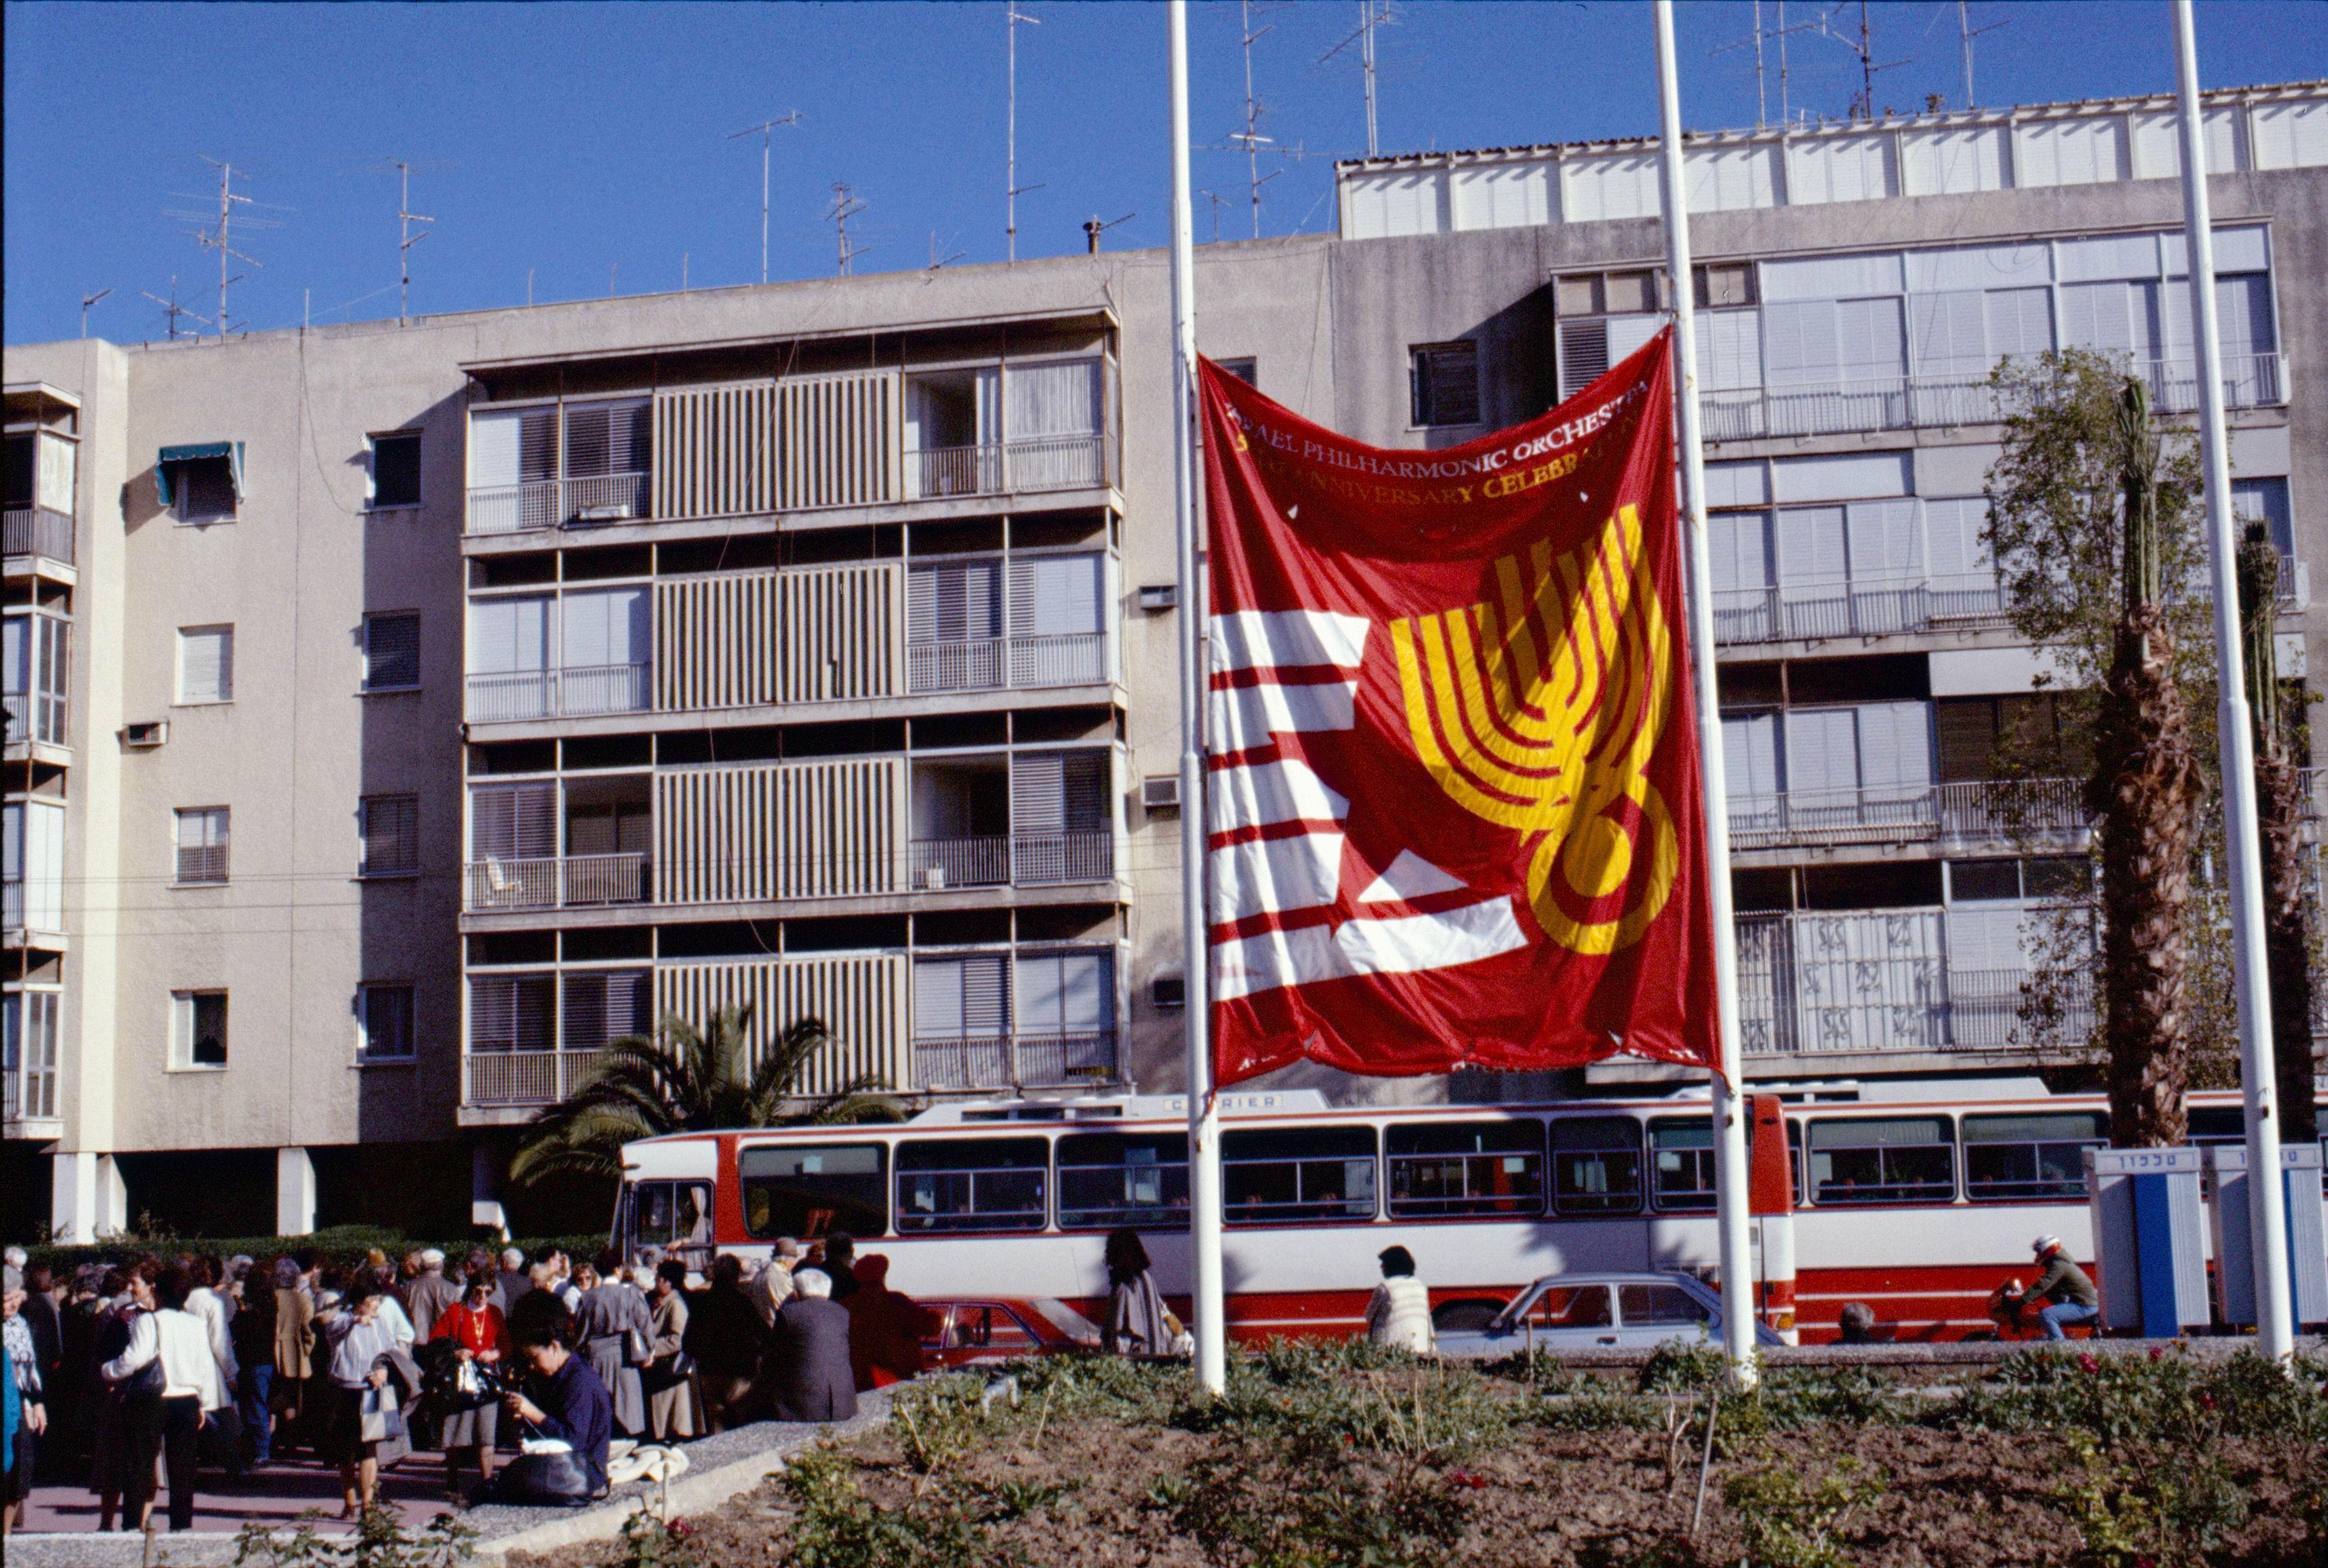 1986_12 (3) TEL-AVIV drapeau du jubilé de l'OP d'Israël